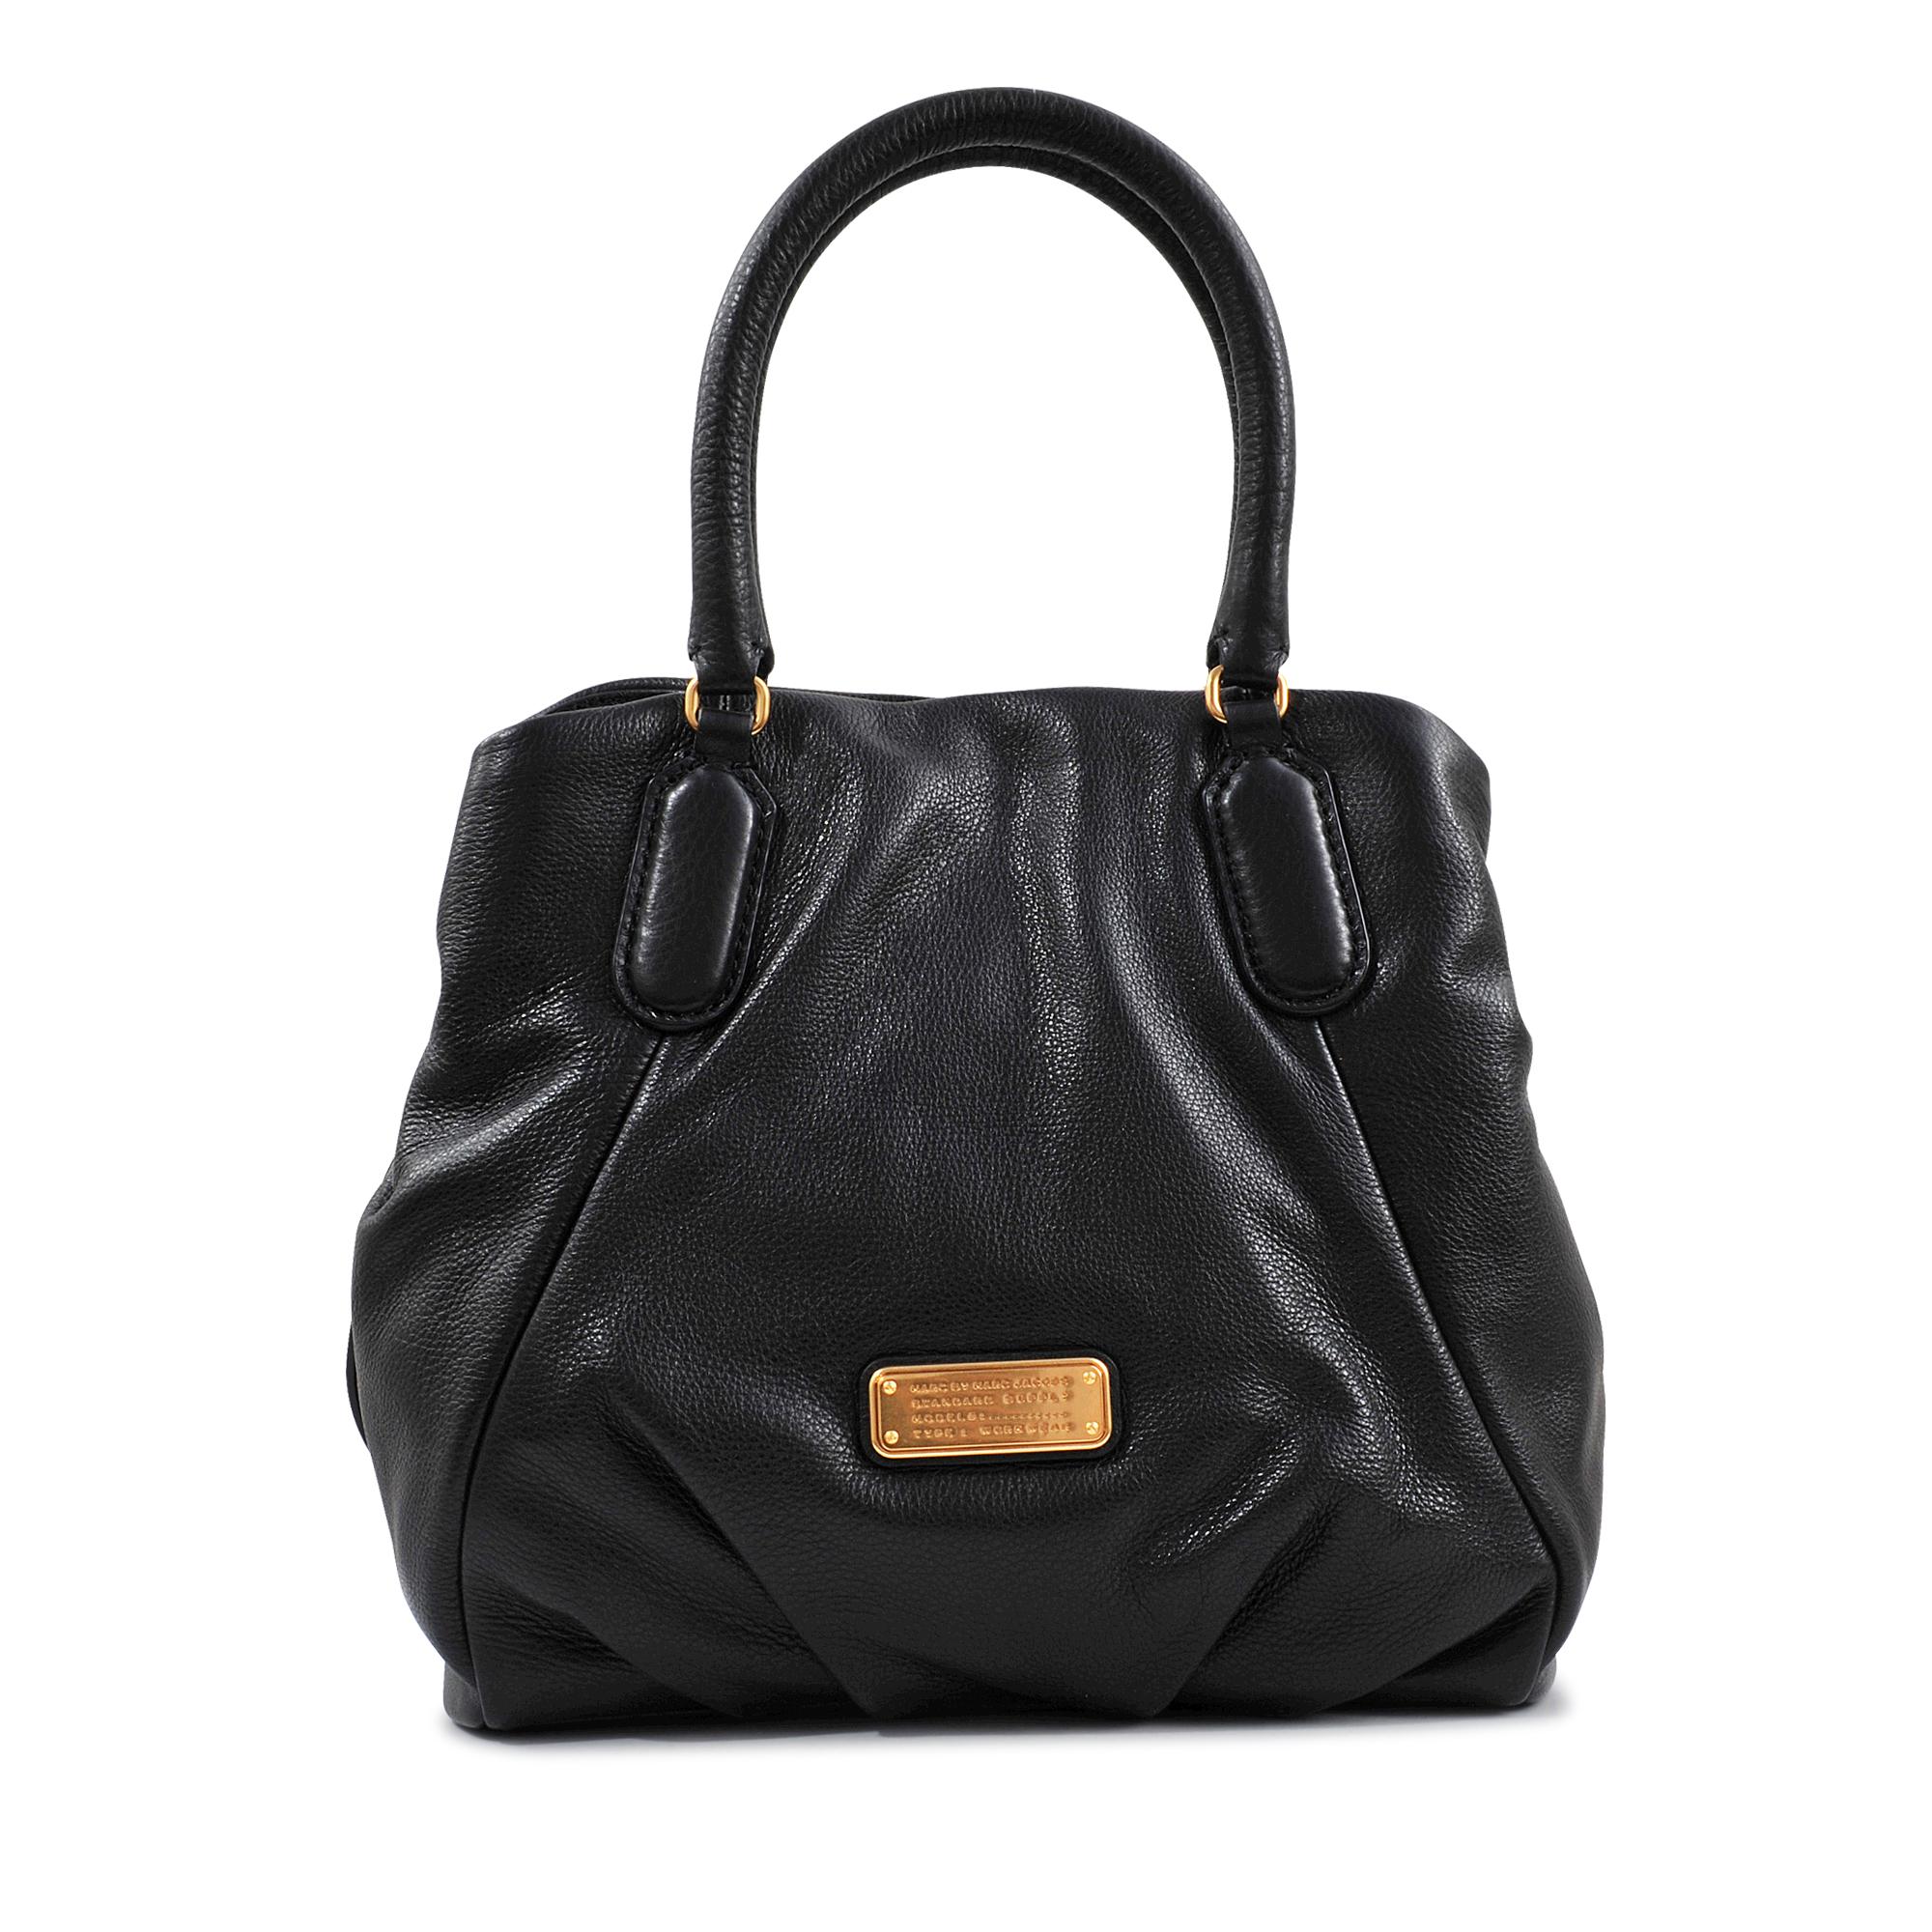 marc by marc jacobs fran new q bag in black lyst. Black Bedroom Furniture Sets. Home Design Ideas